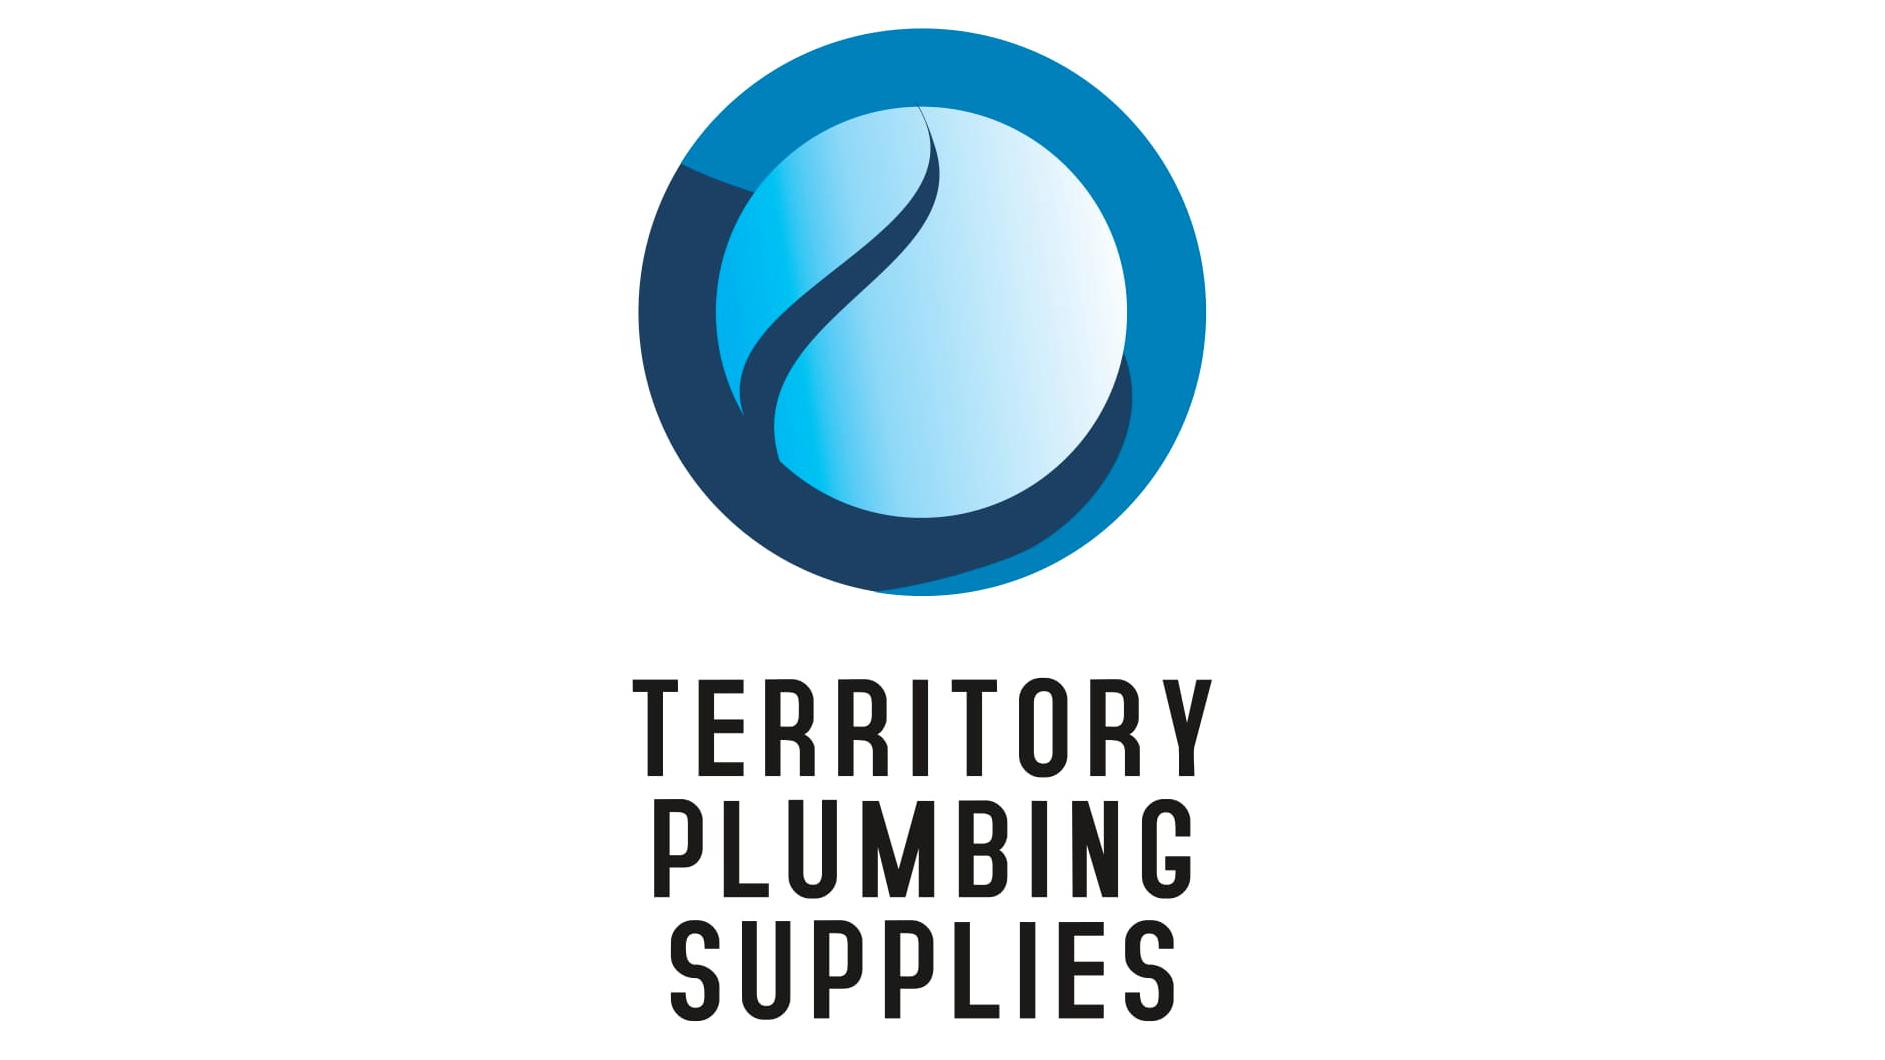 Territory Plumbing Supplies